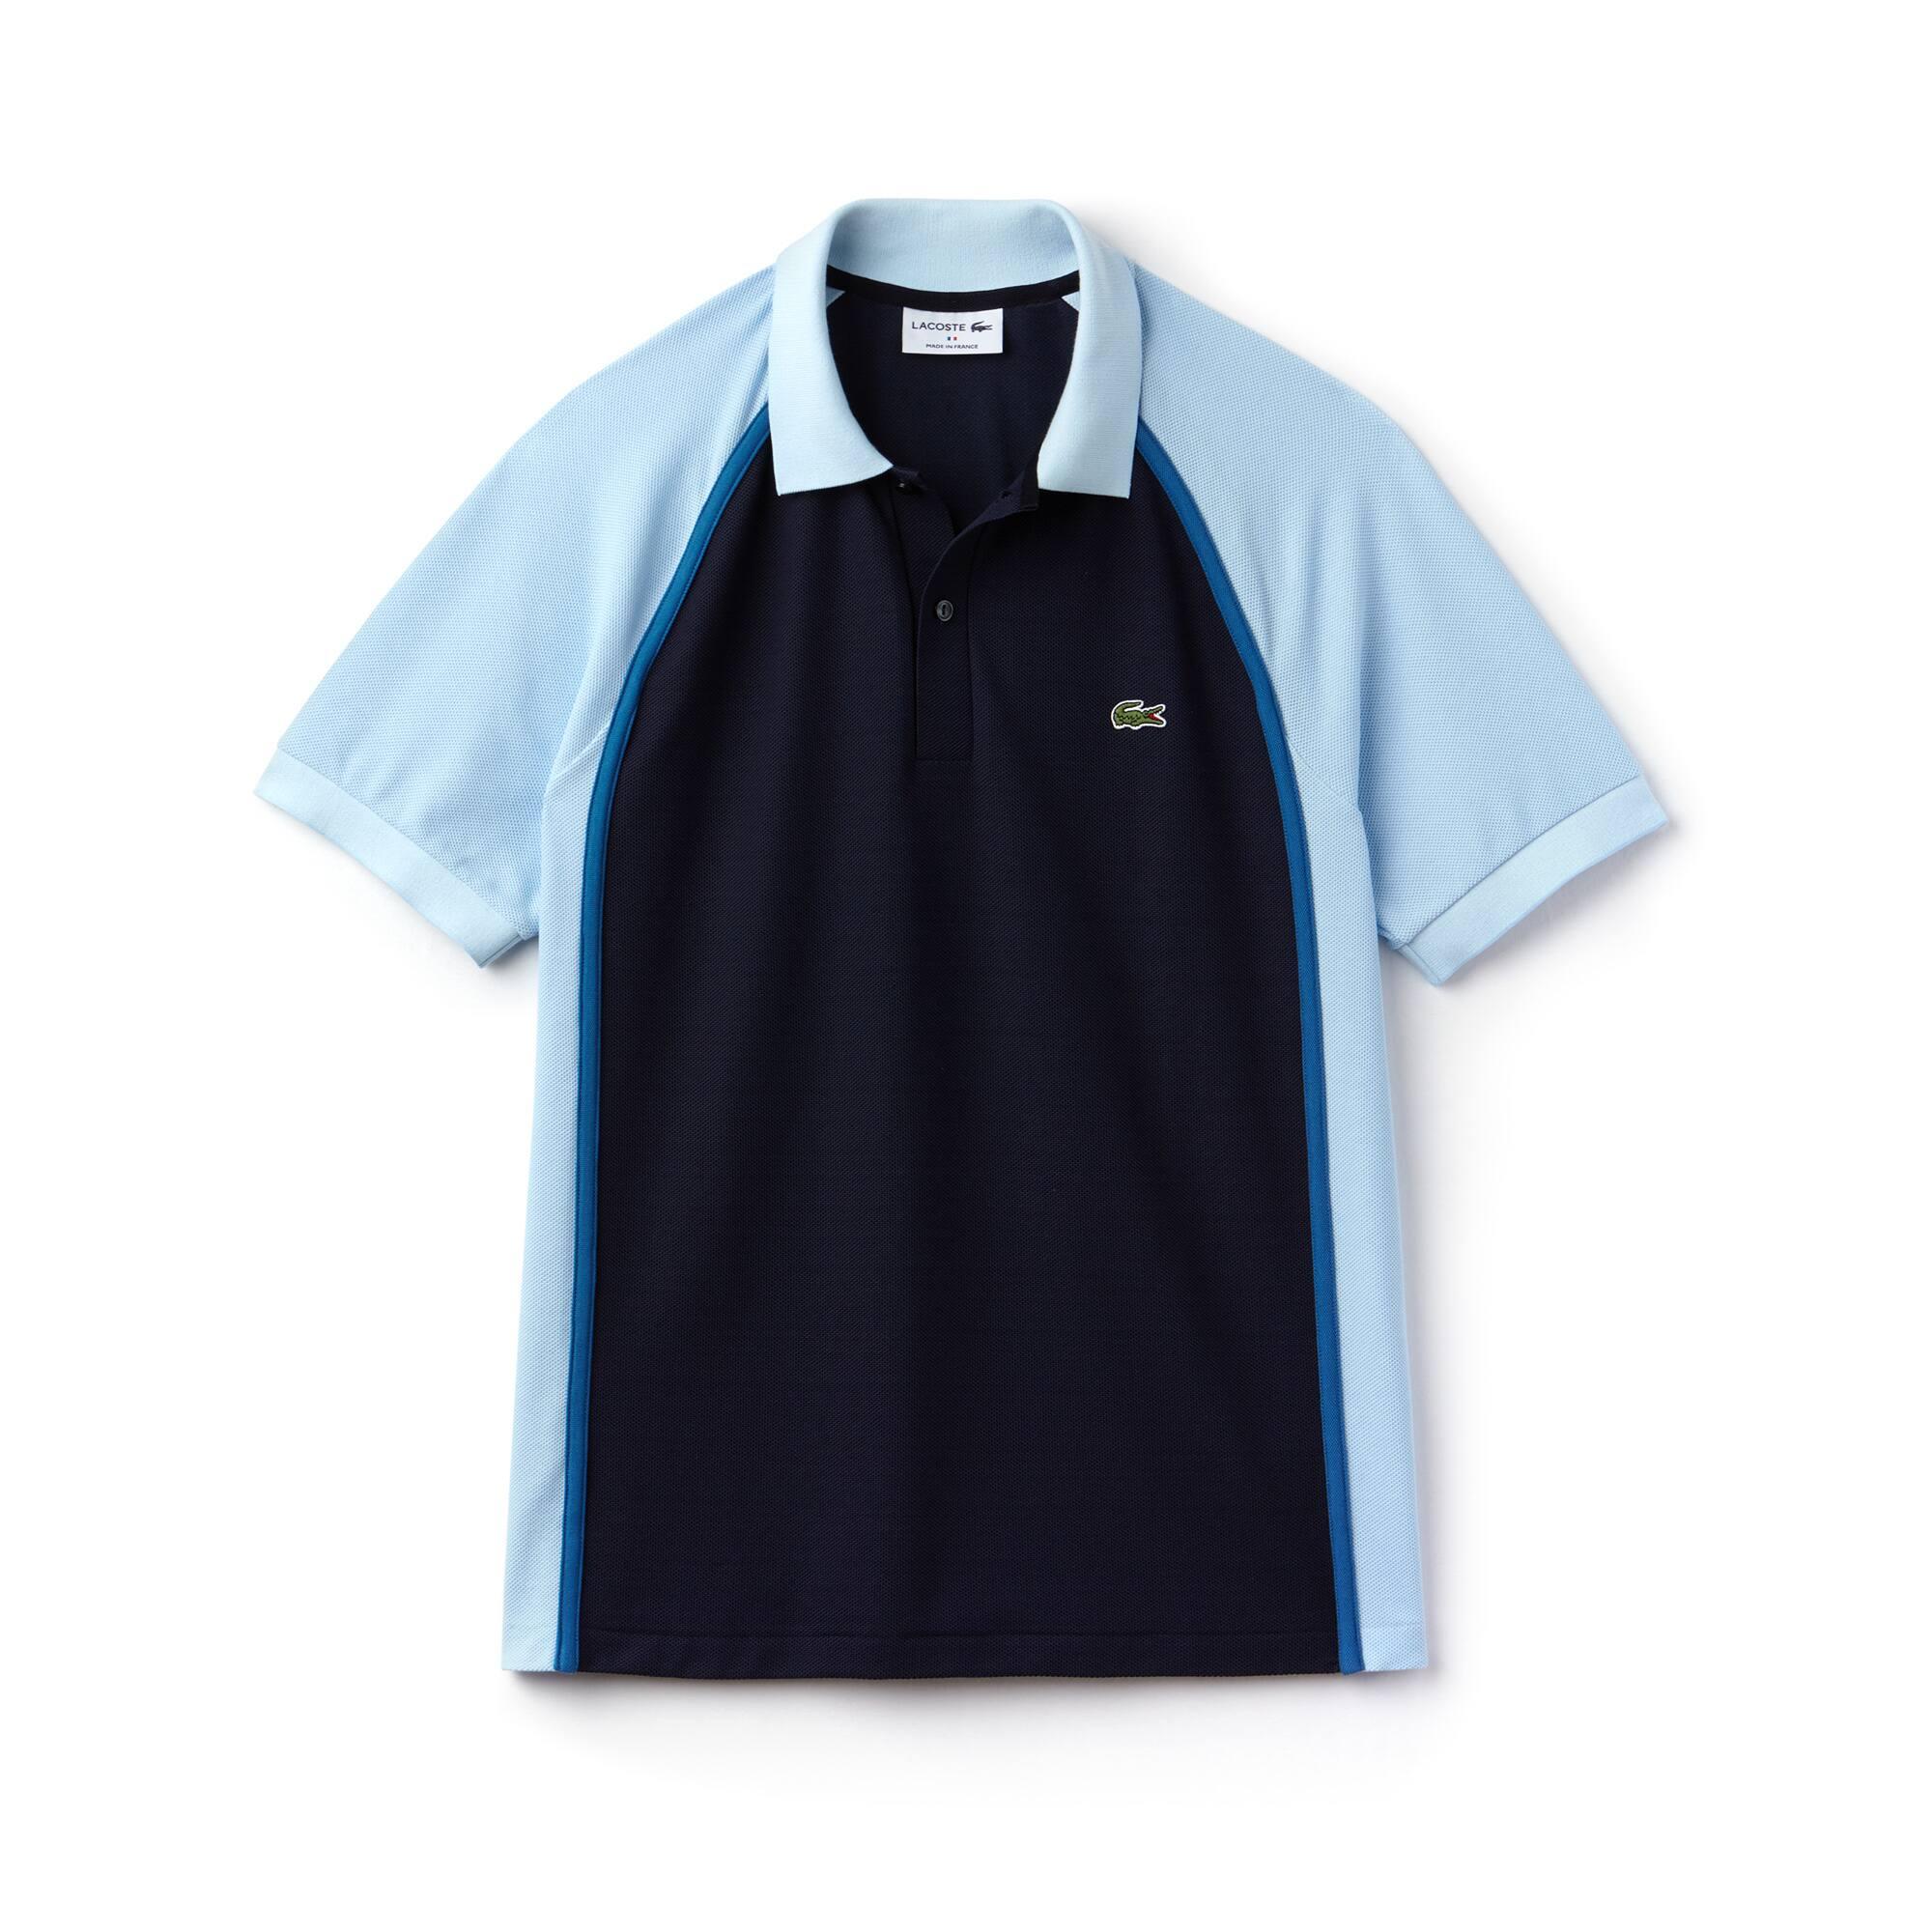 Men's Lacoste Made in France Regular Fit Colorblock Tech Piqué Polo